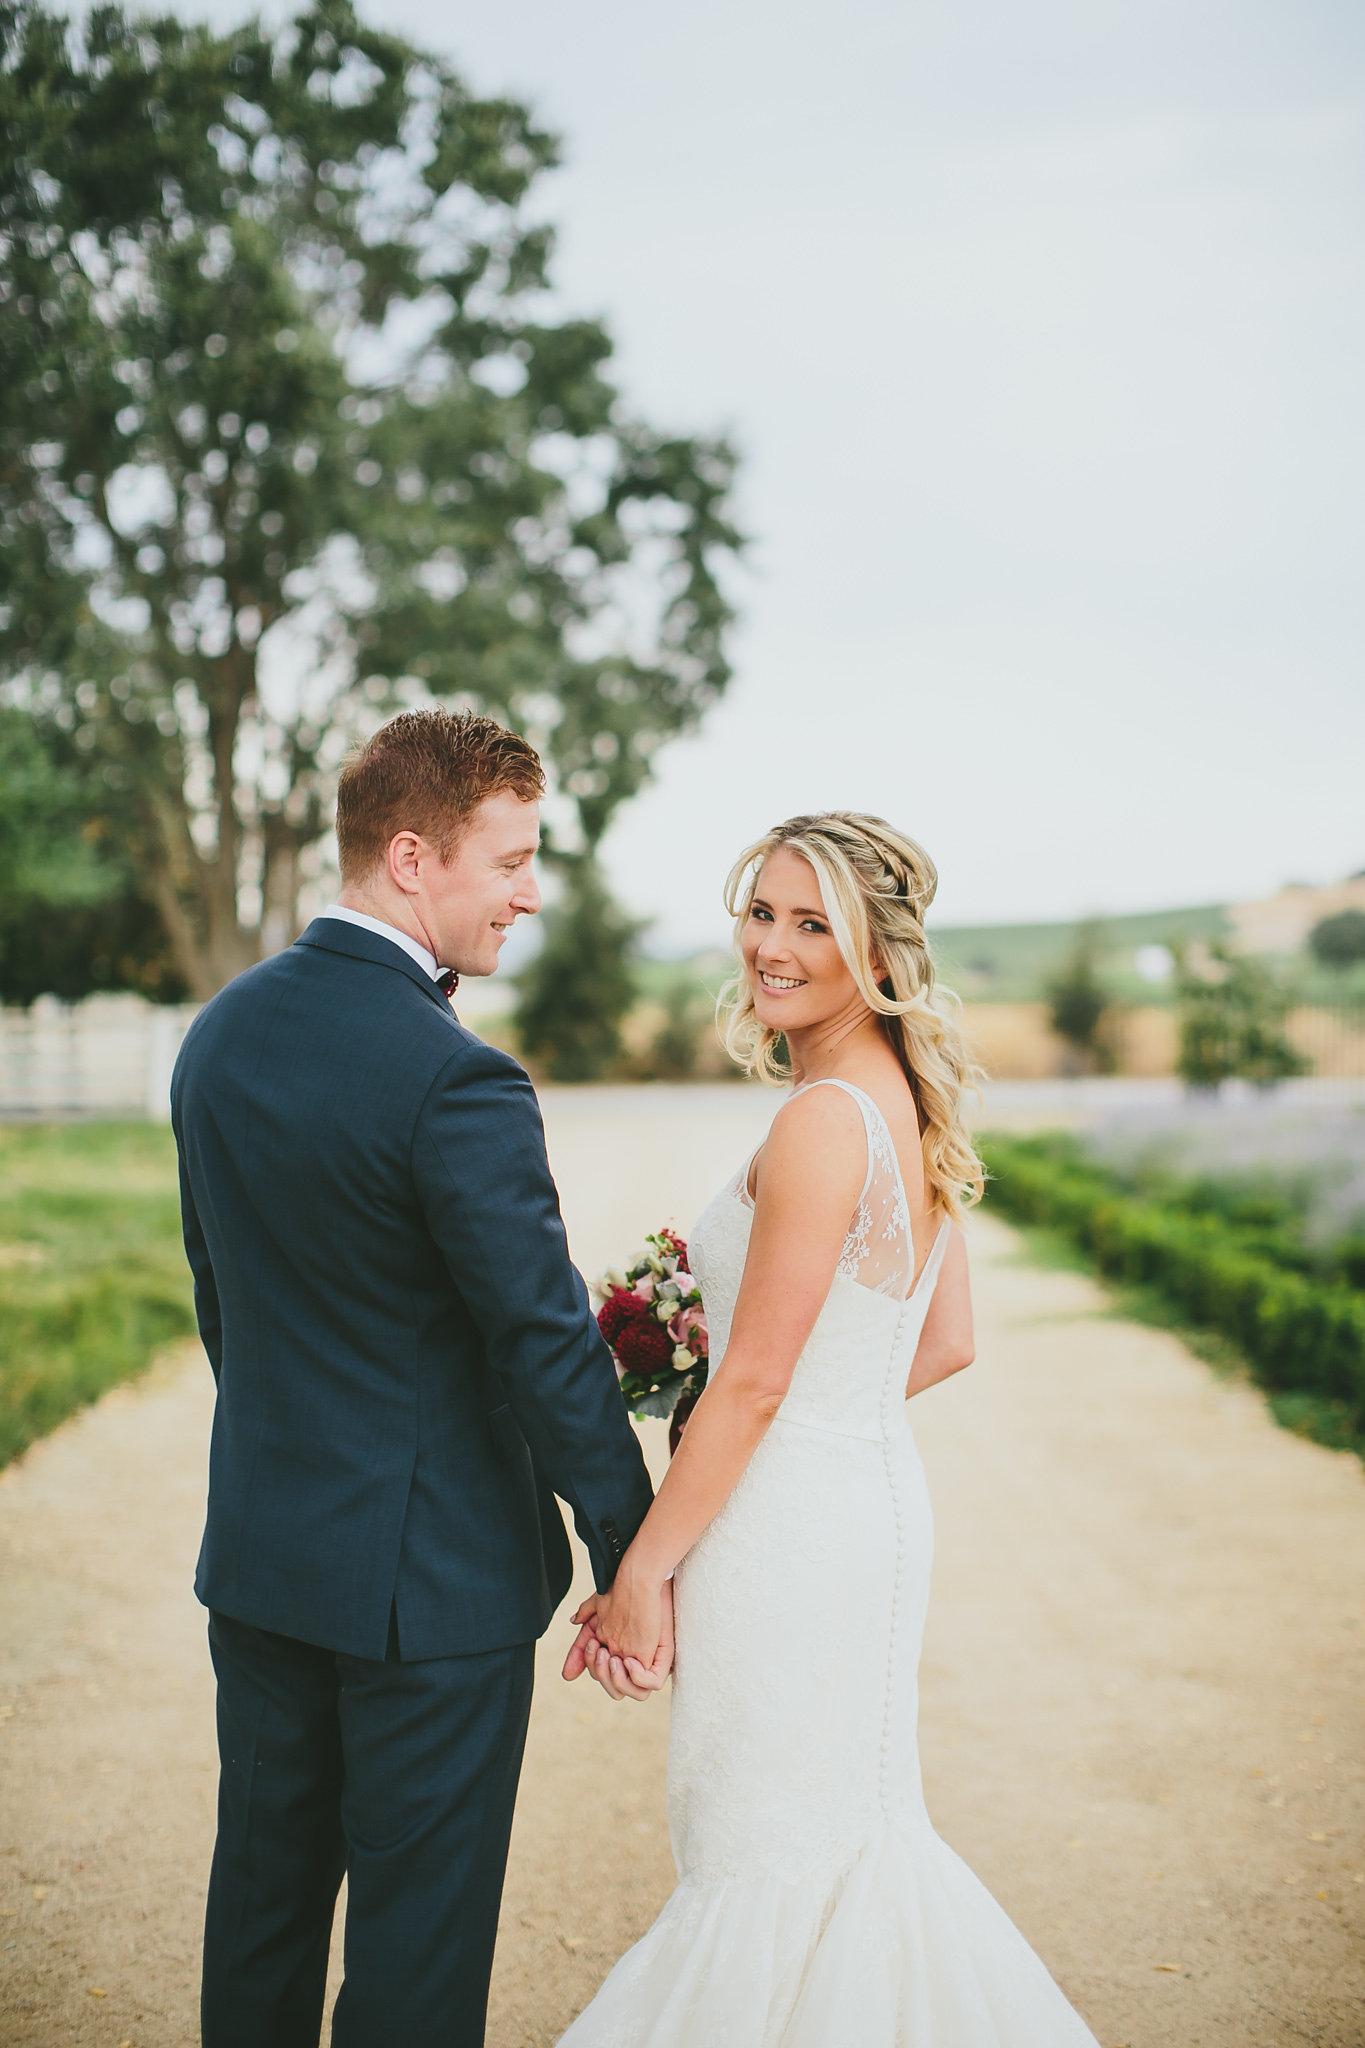 Kristen+Nick-WEDDING_WEB-200.jpg